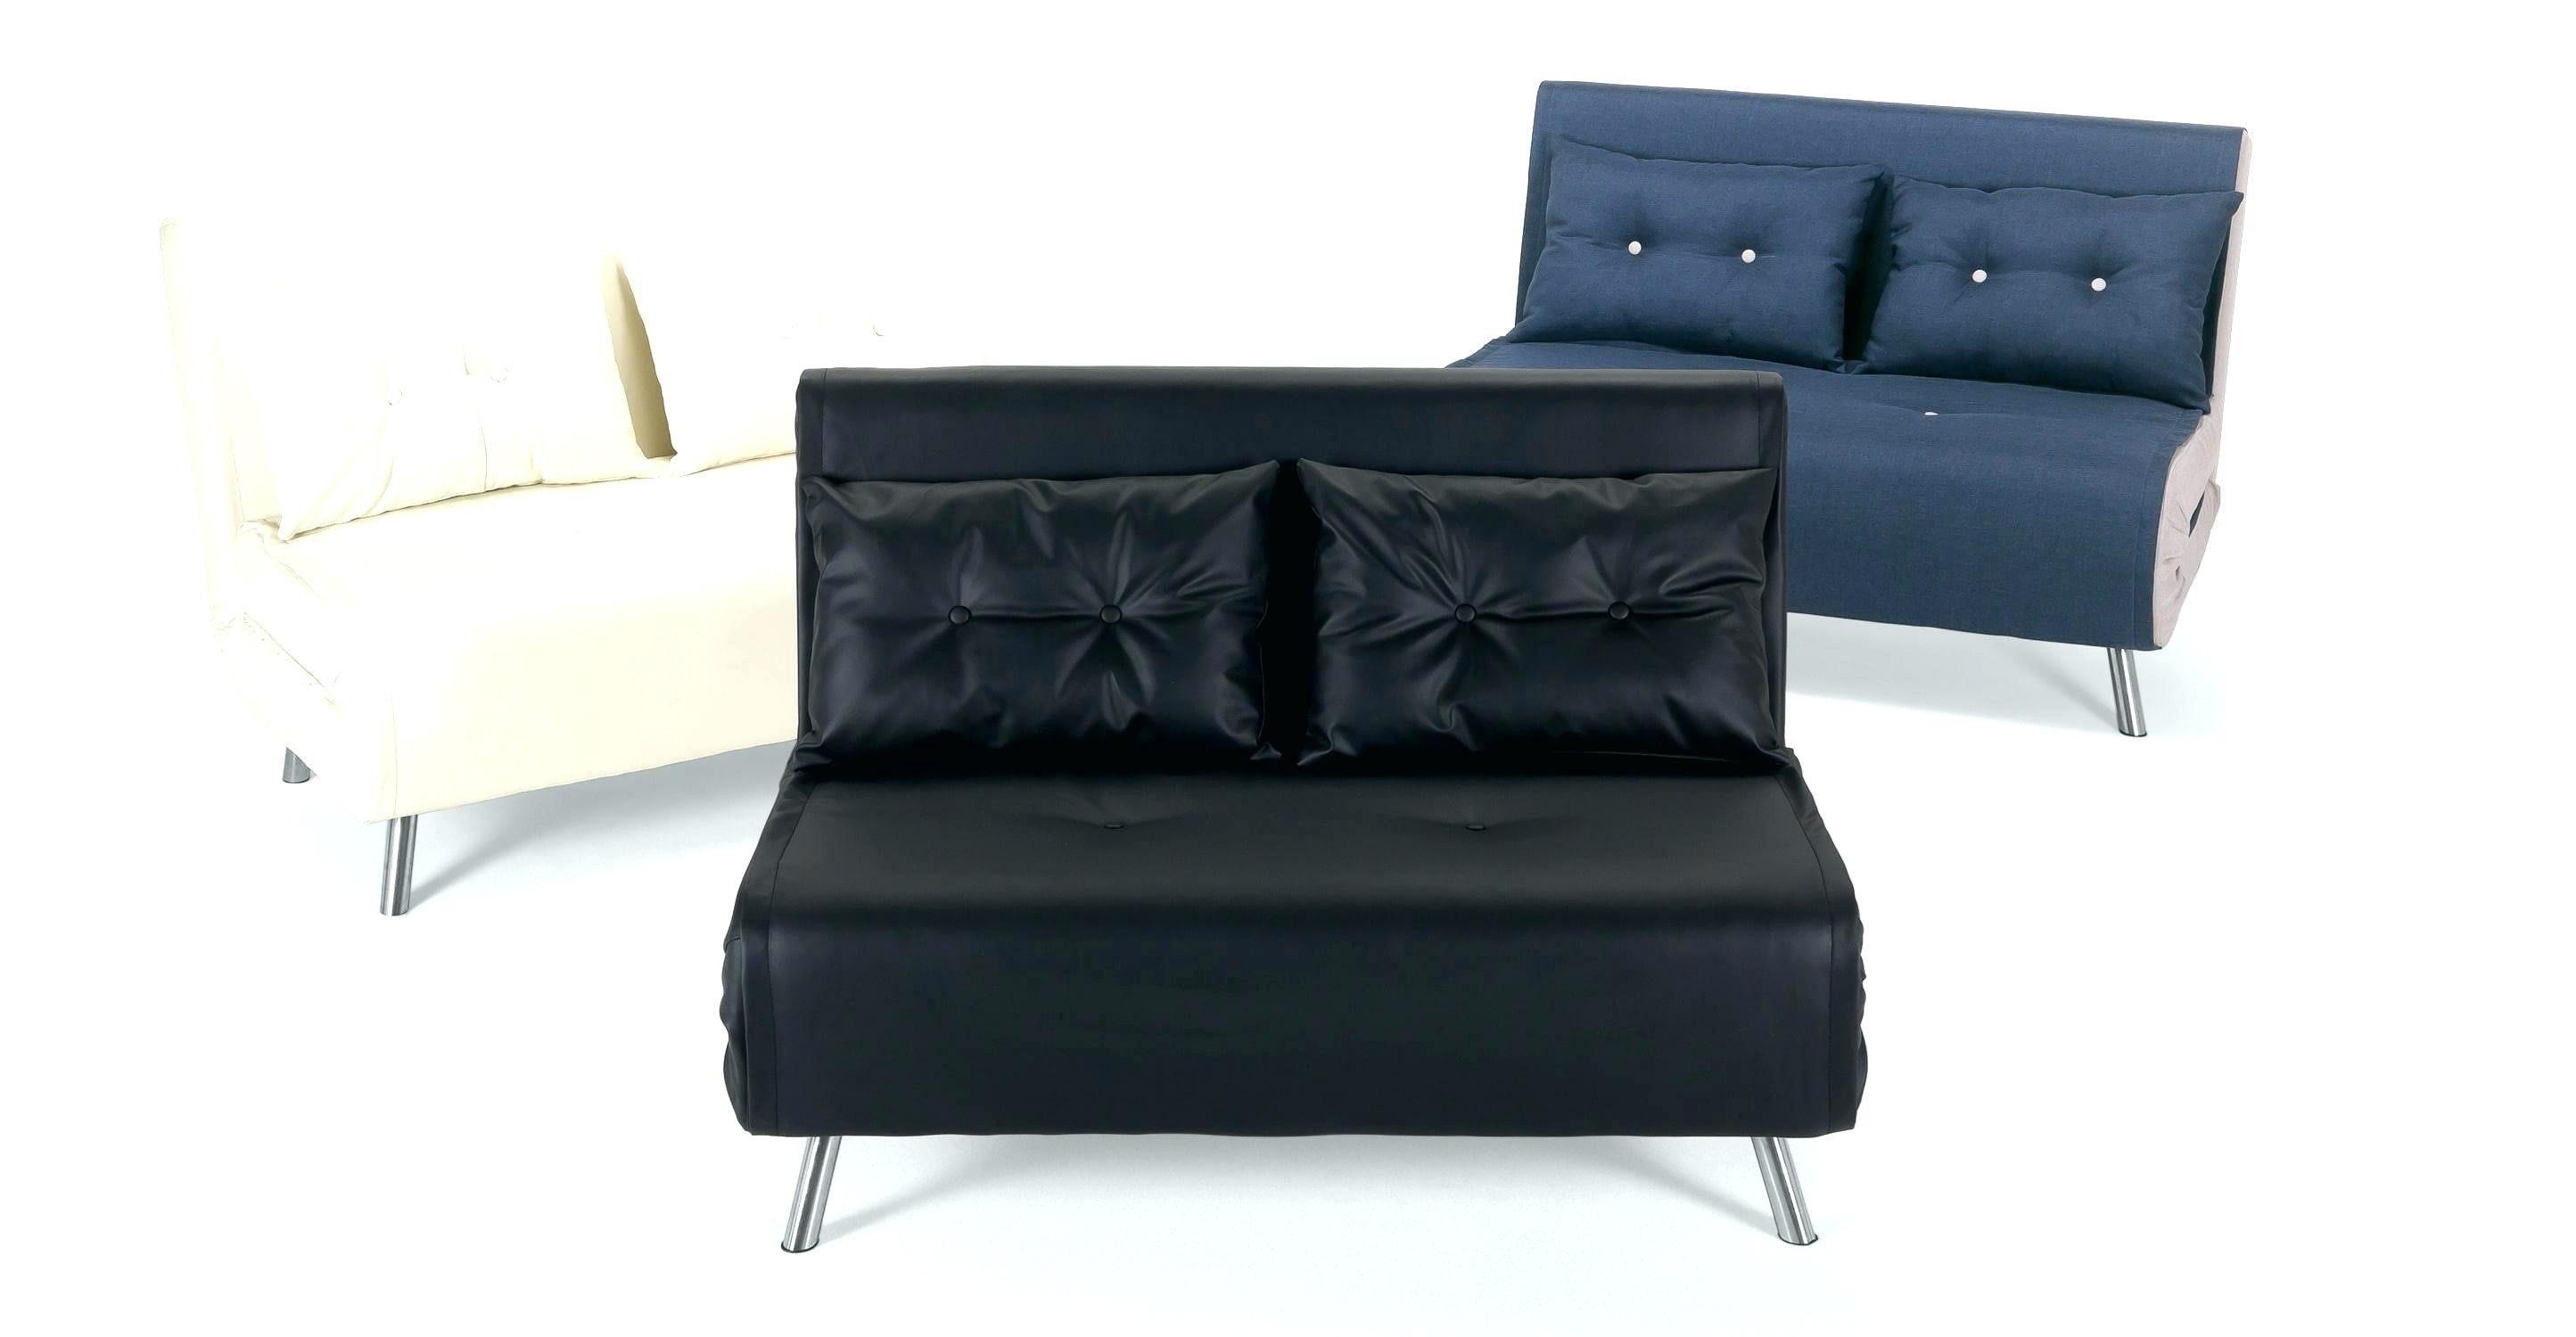 Canape Lit Meridienne Joli Meri Nne Convertible Lit Table D Angle Lounge Mobel Paletten Table